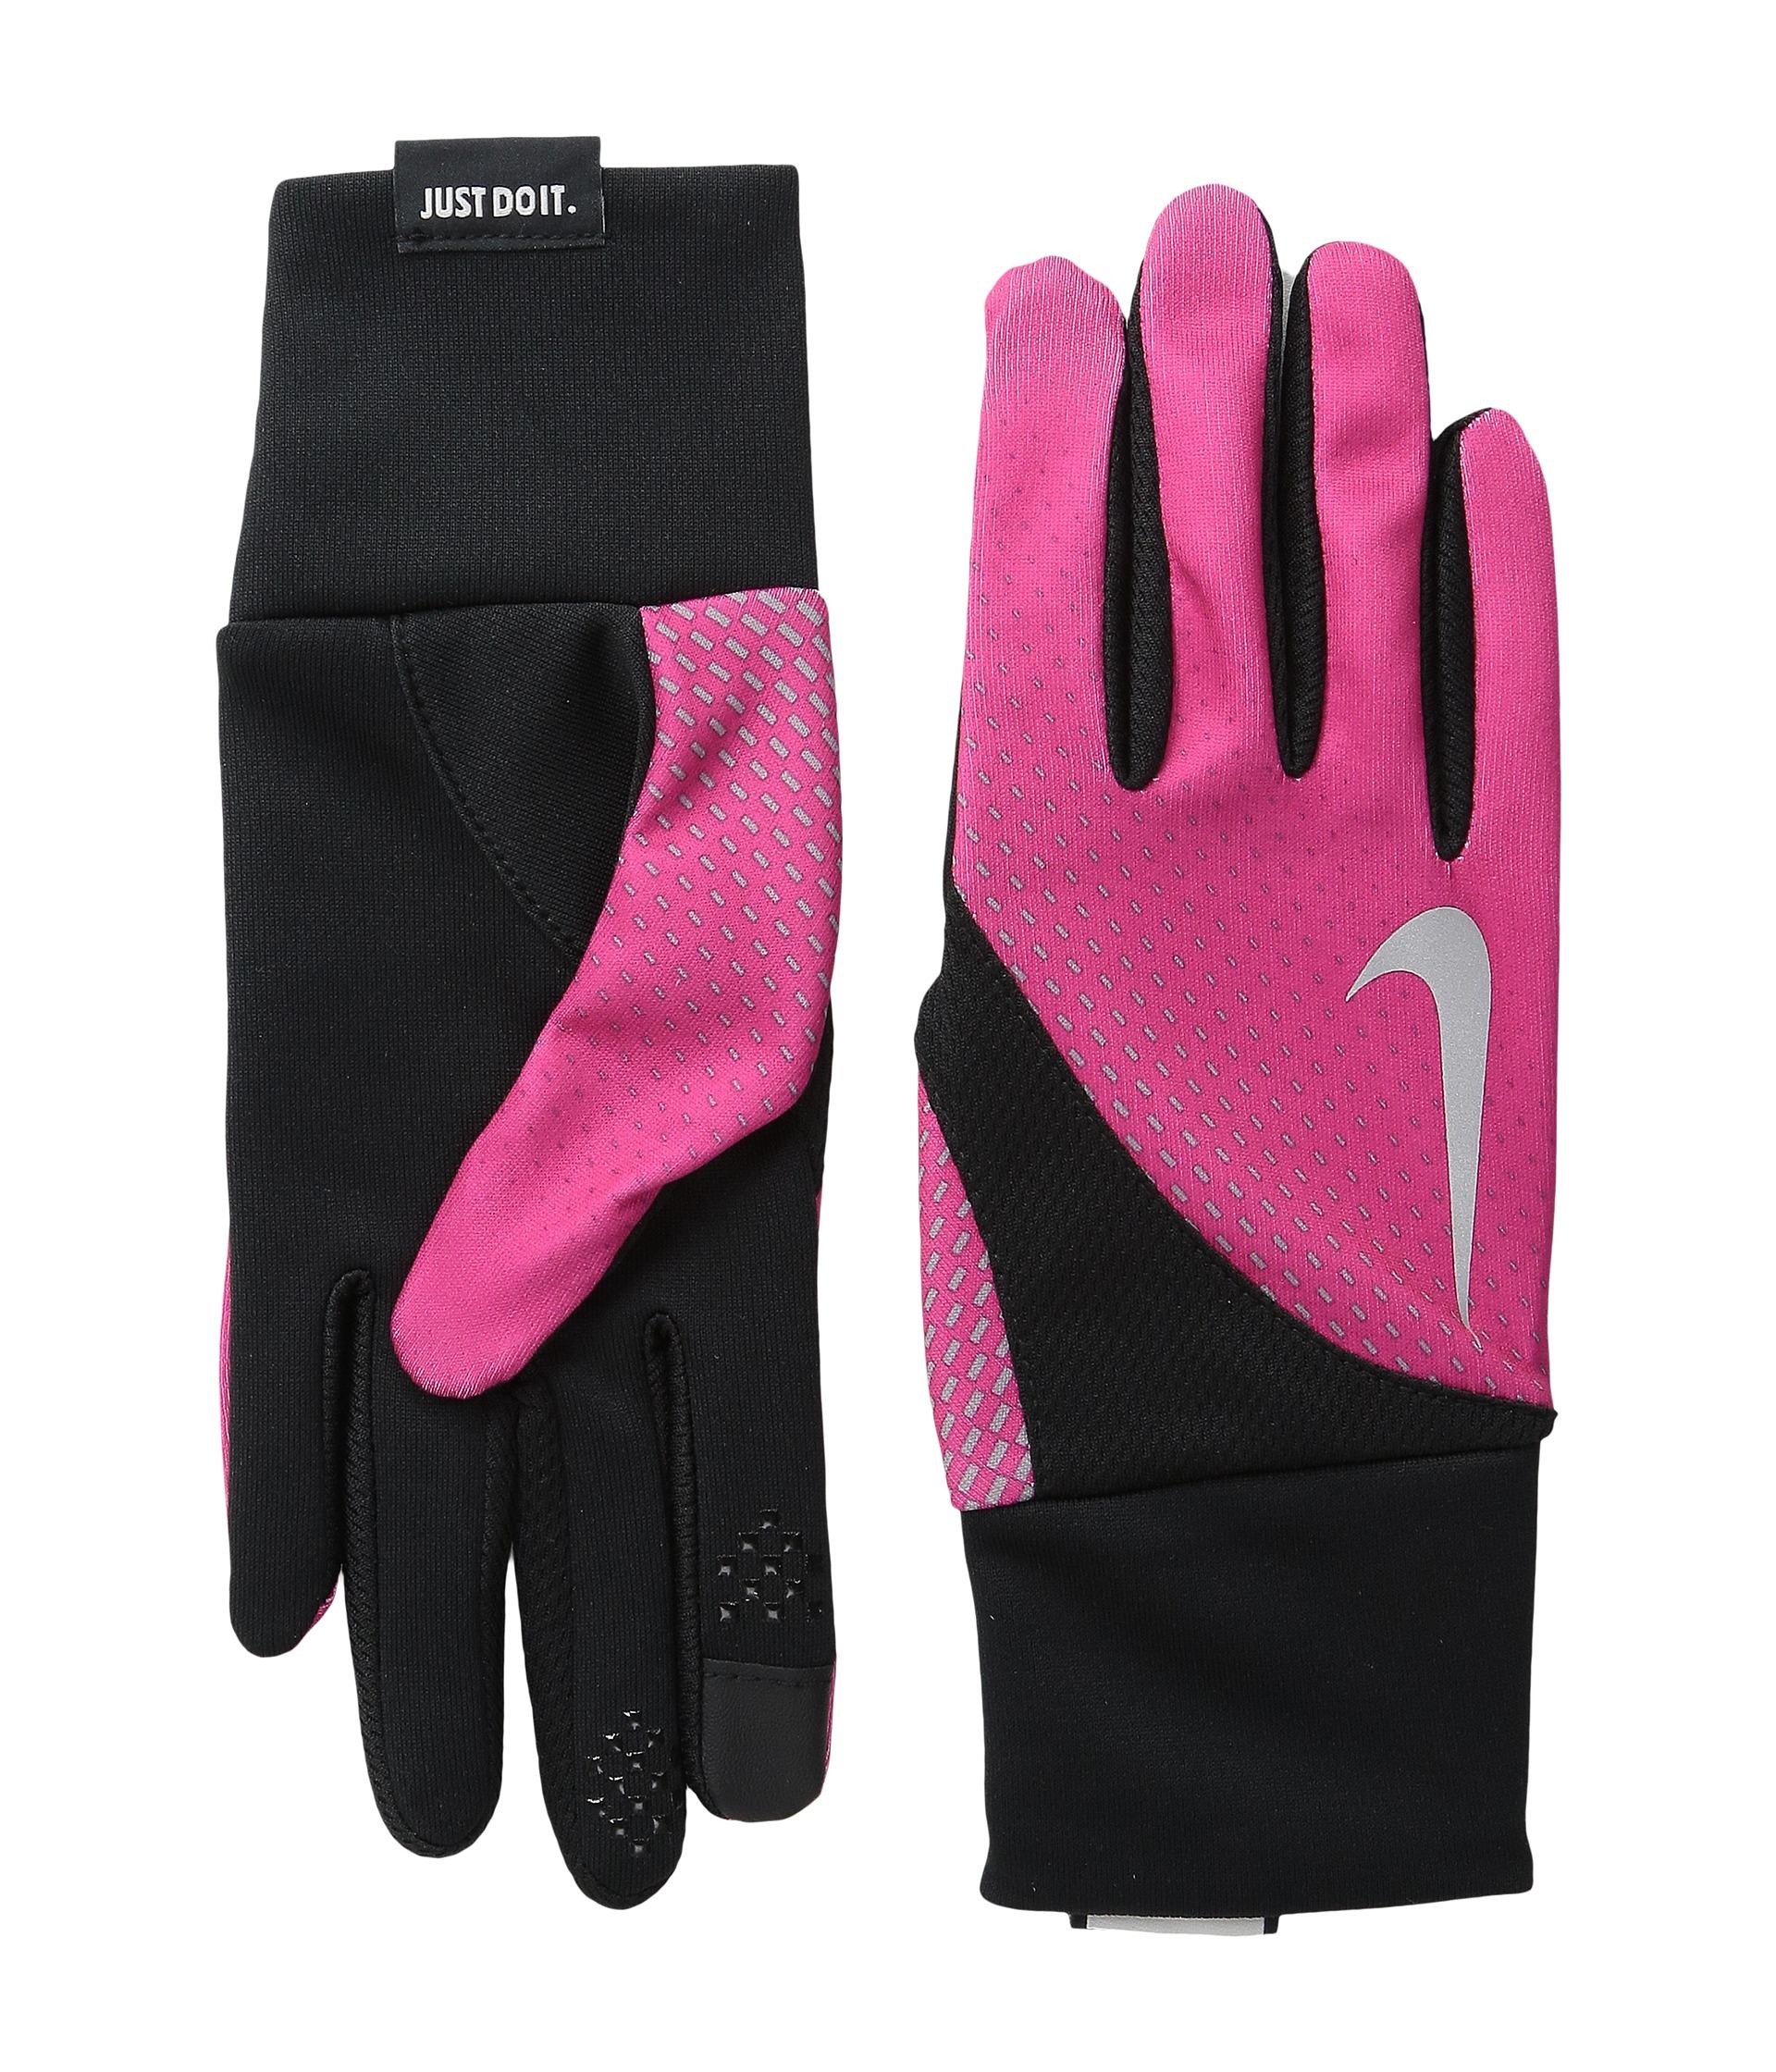 Nike Gloves Rn 56323: Nike Dri-fit Tailwind Run Gloves In Pink